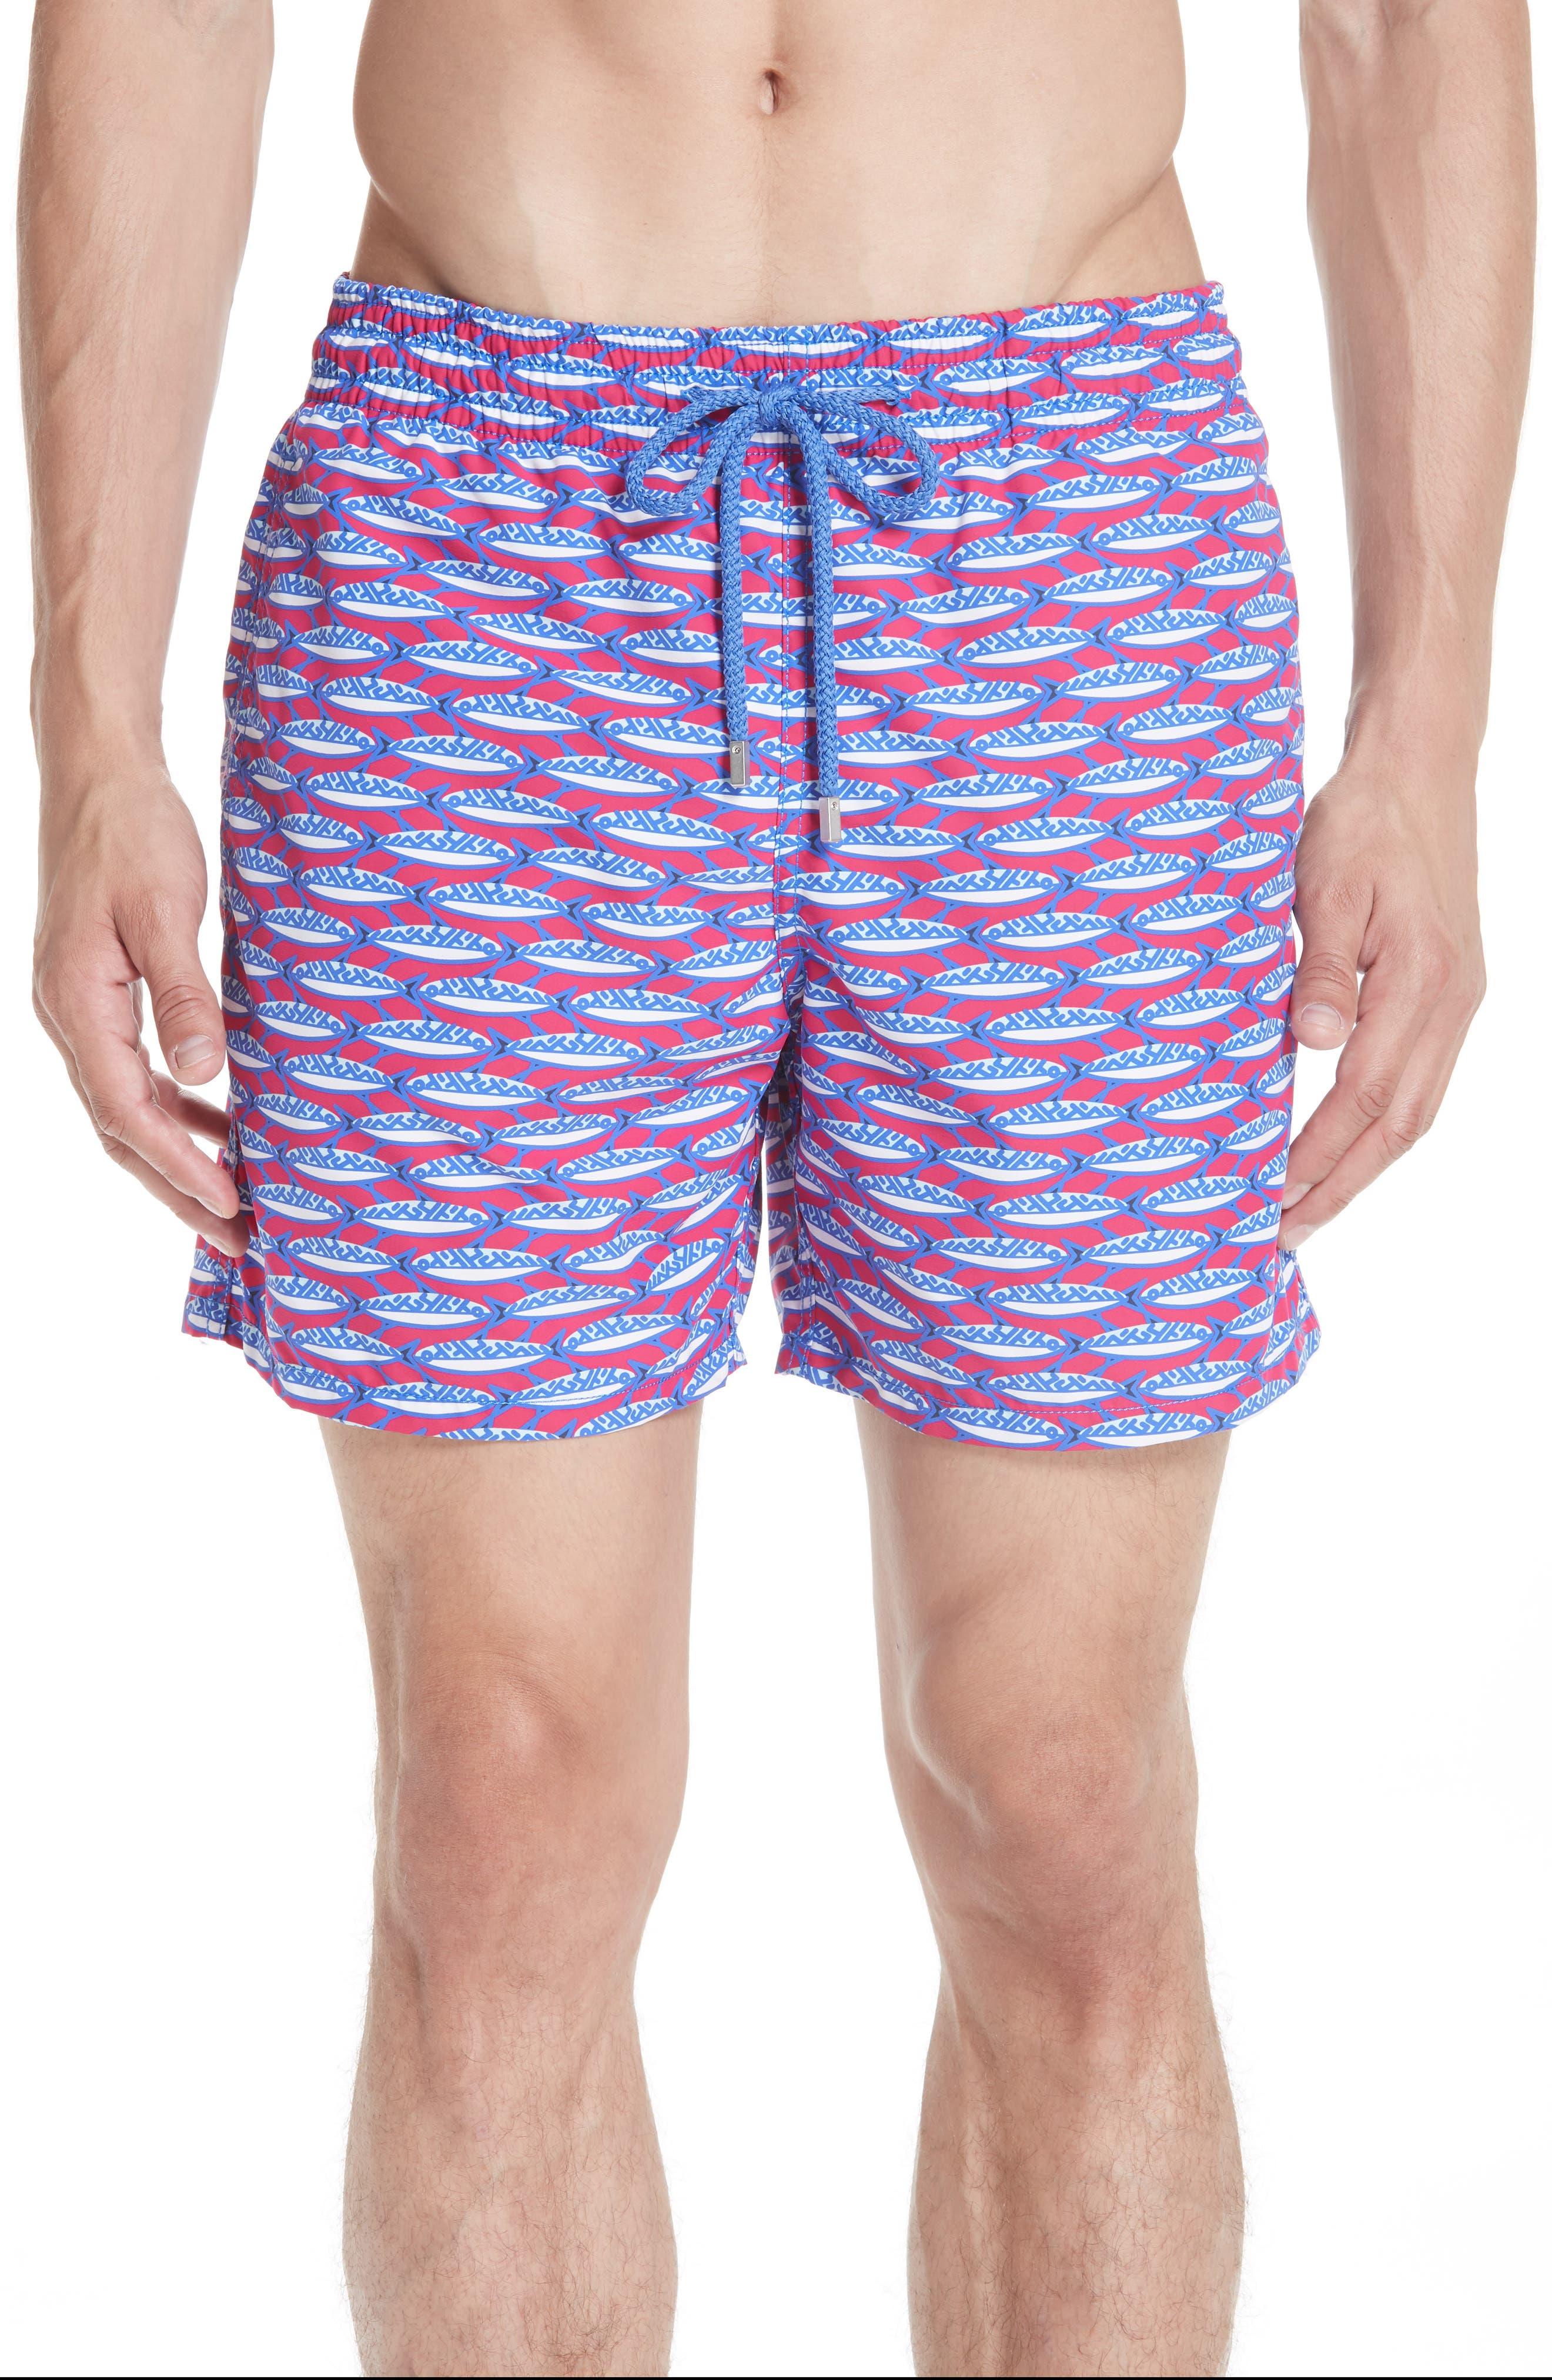 Marbella Print Swim Trunks,                         Main,                         color, MULTI